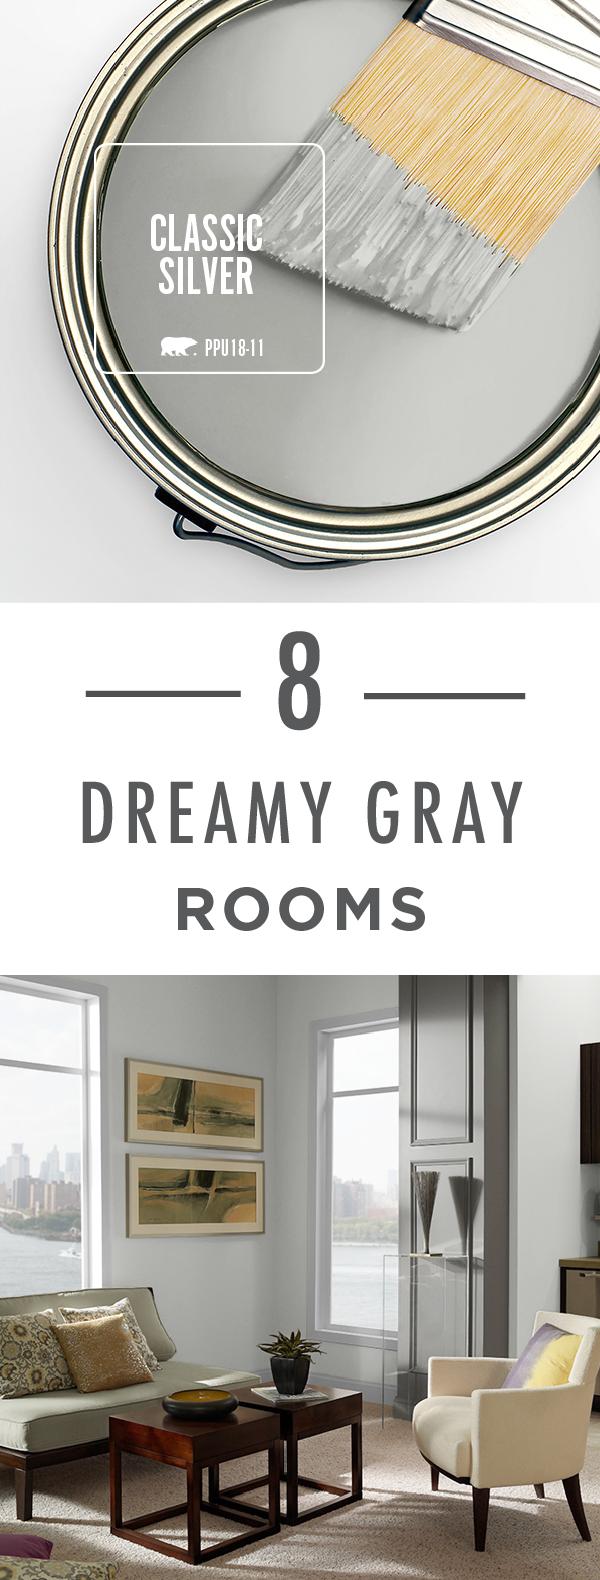 Innenfarbe im haus grays  interior colors  inspirations  wohnideen  pinterest